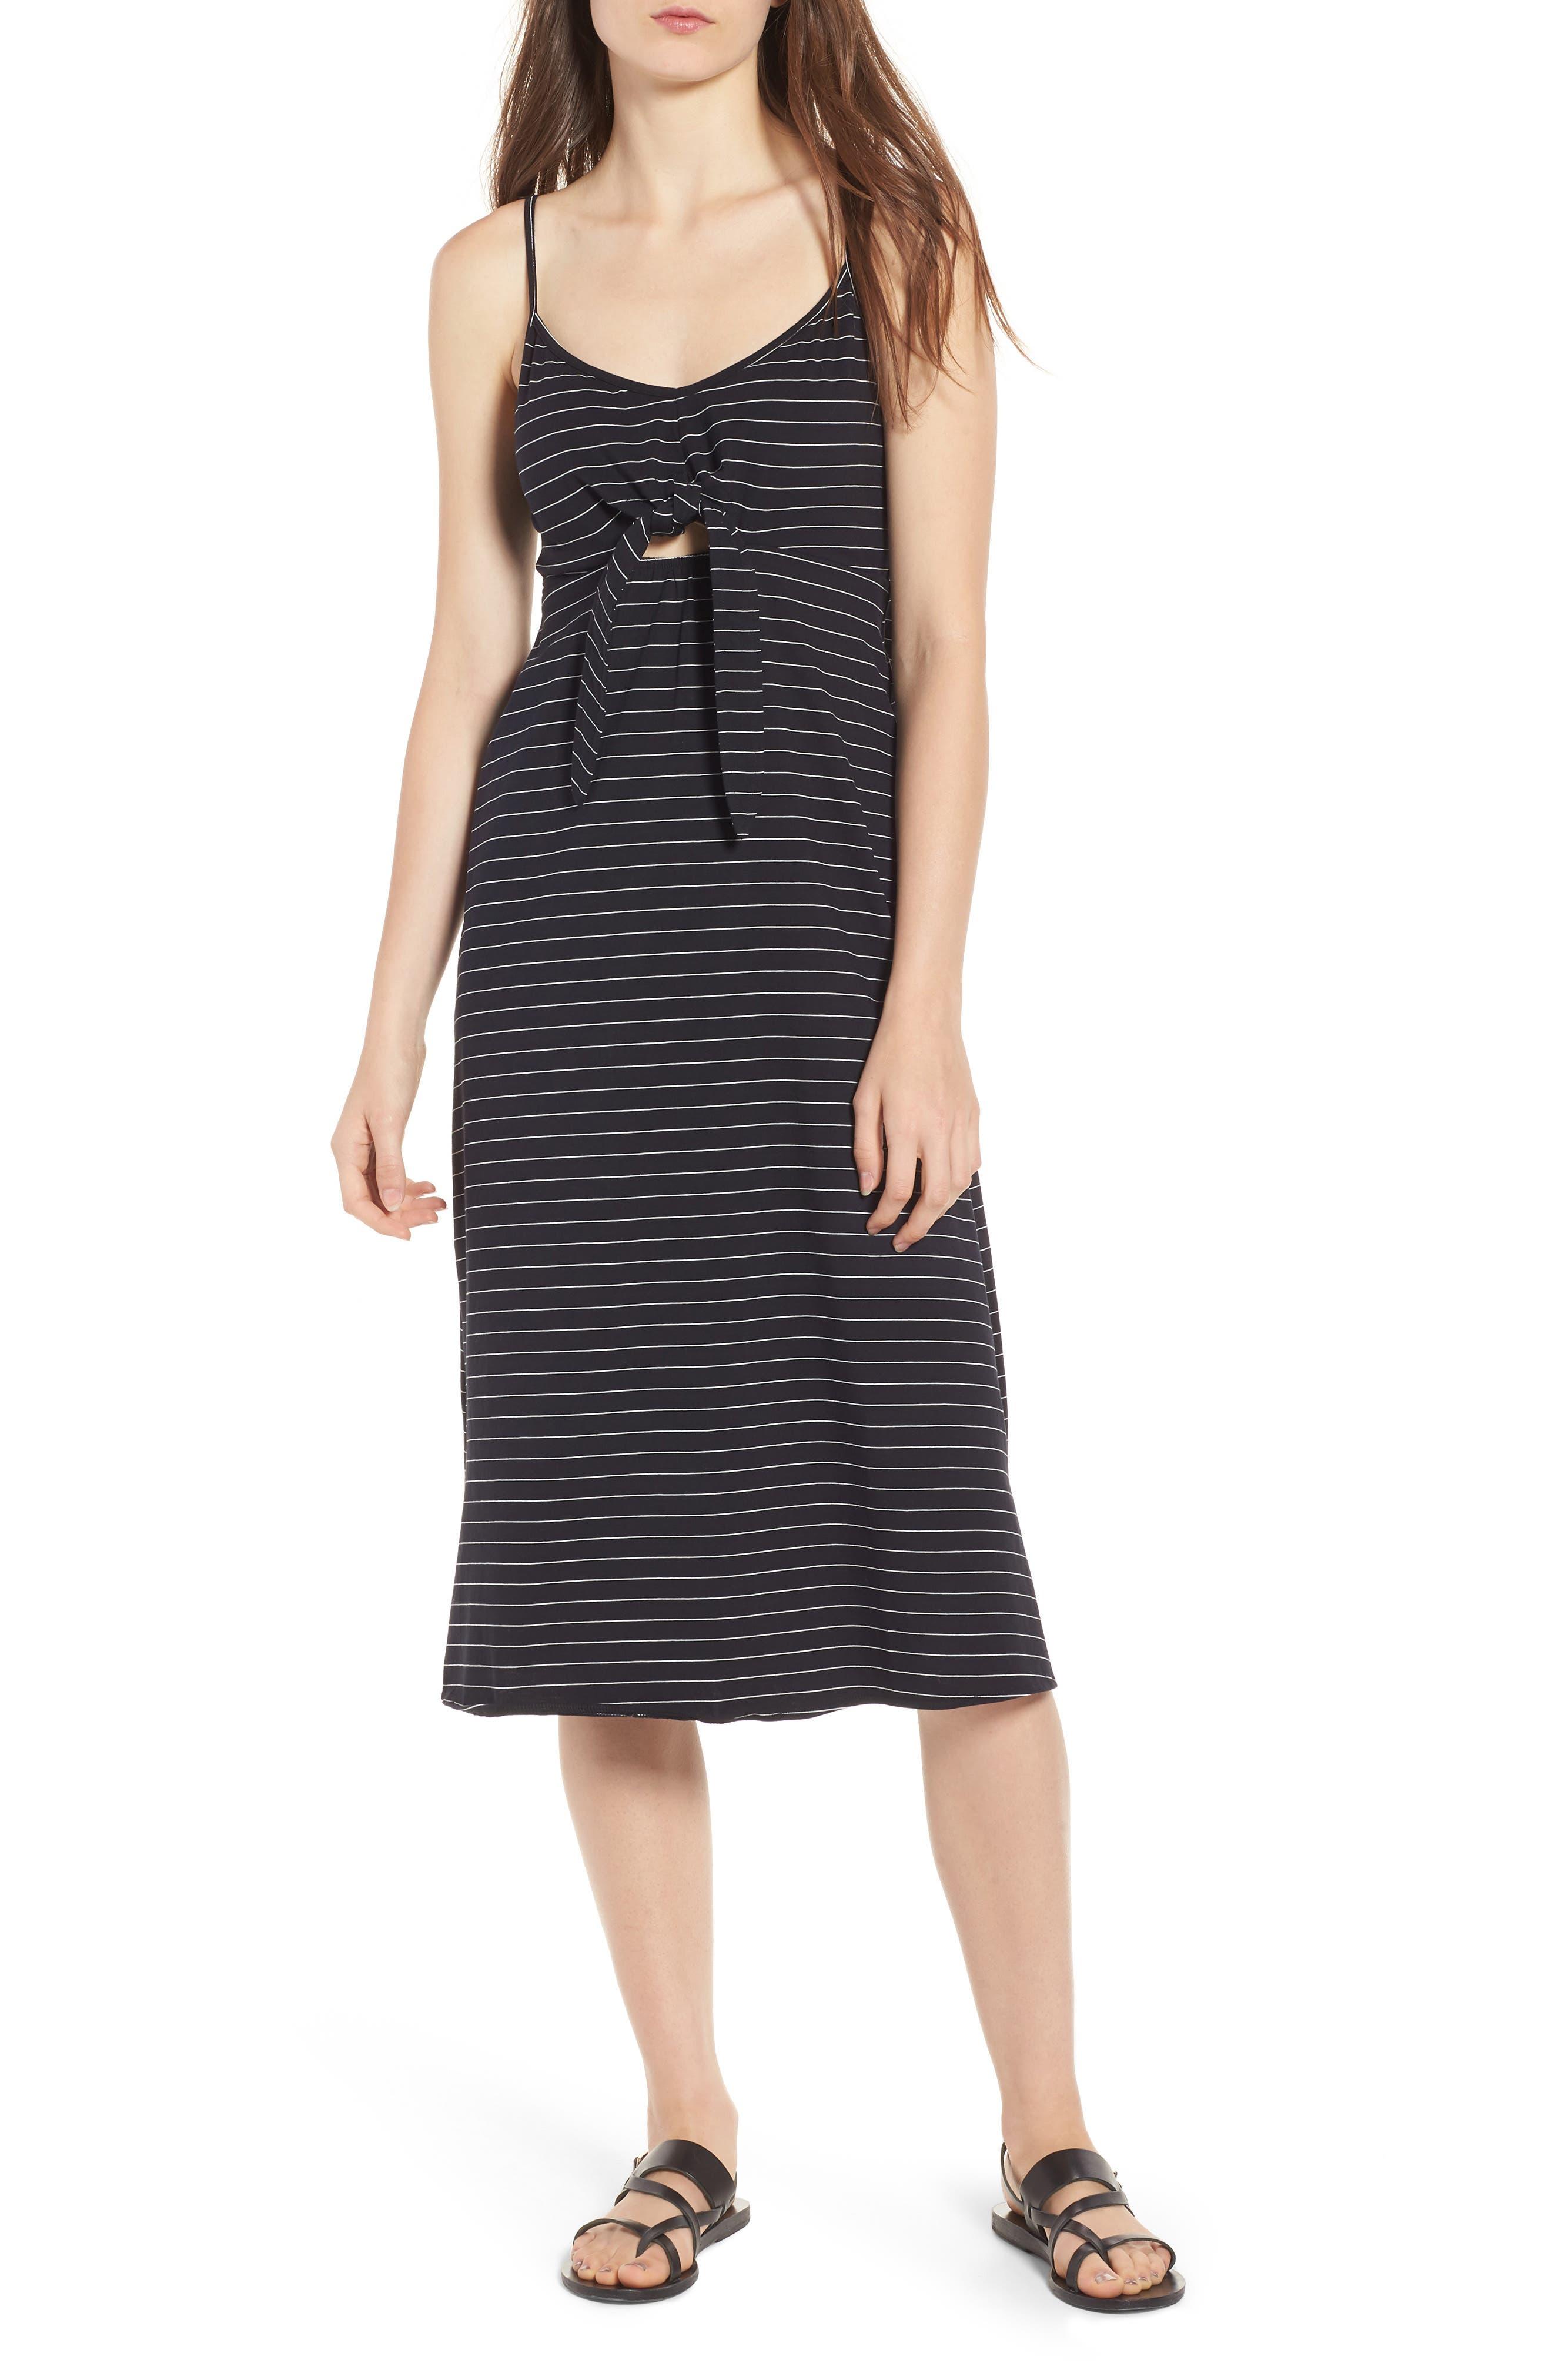 Suzanne Knot Front Dress,                         Main,                         color, Black